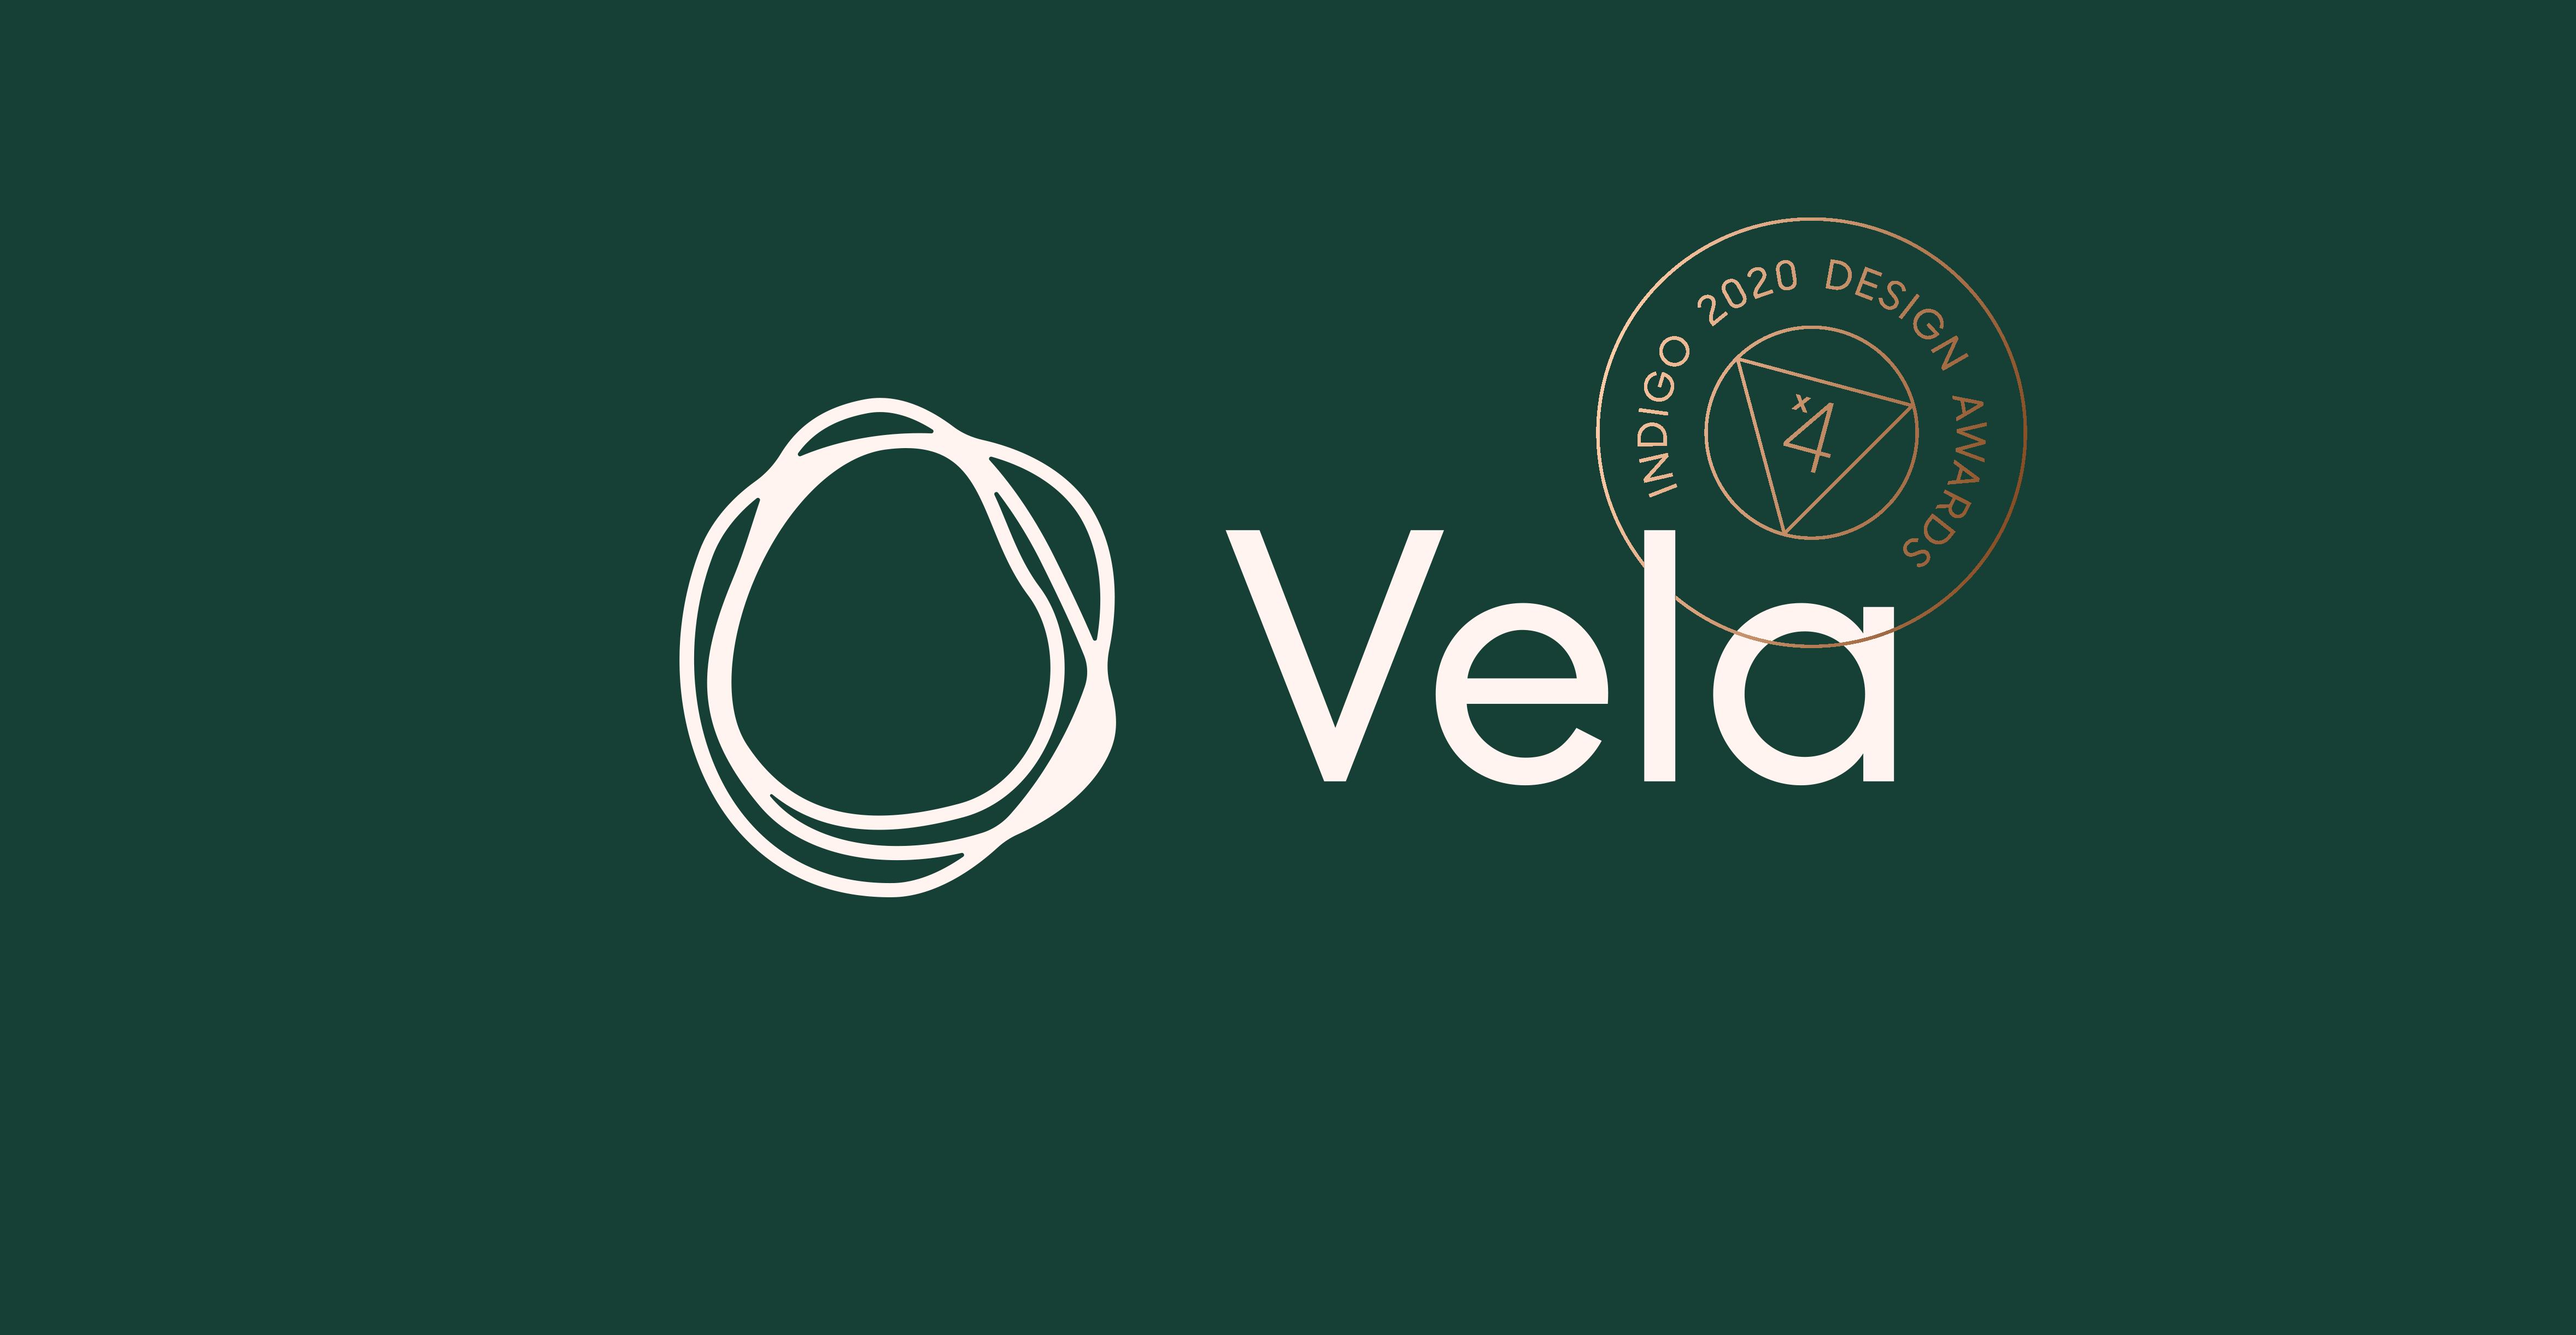 Vela™ Brand Strategy & Identity Wins the Gold at the 2020 Annual Indigo Design Award